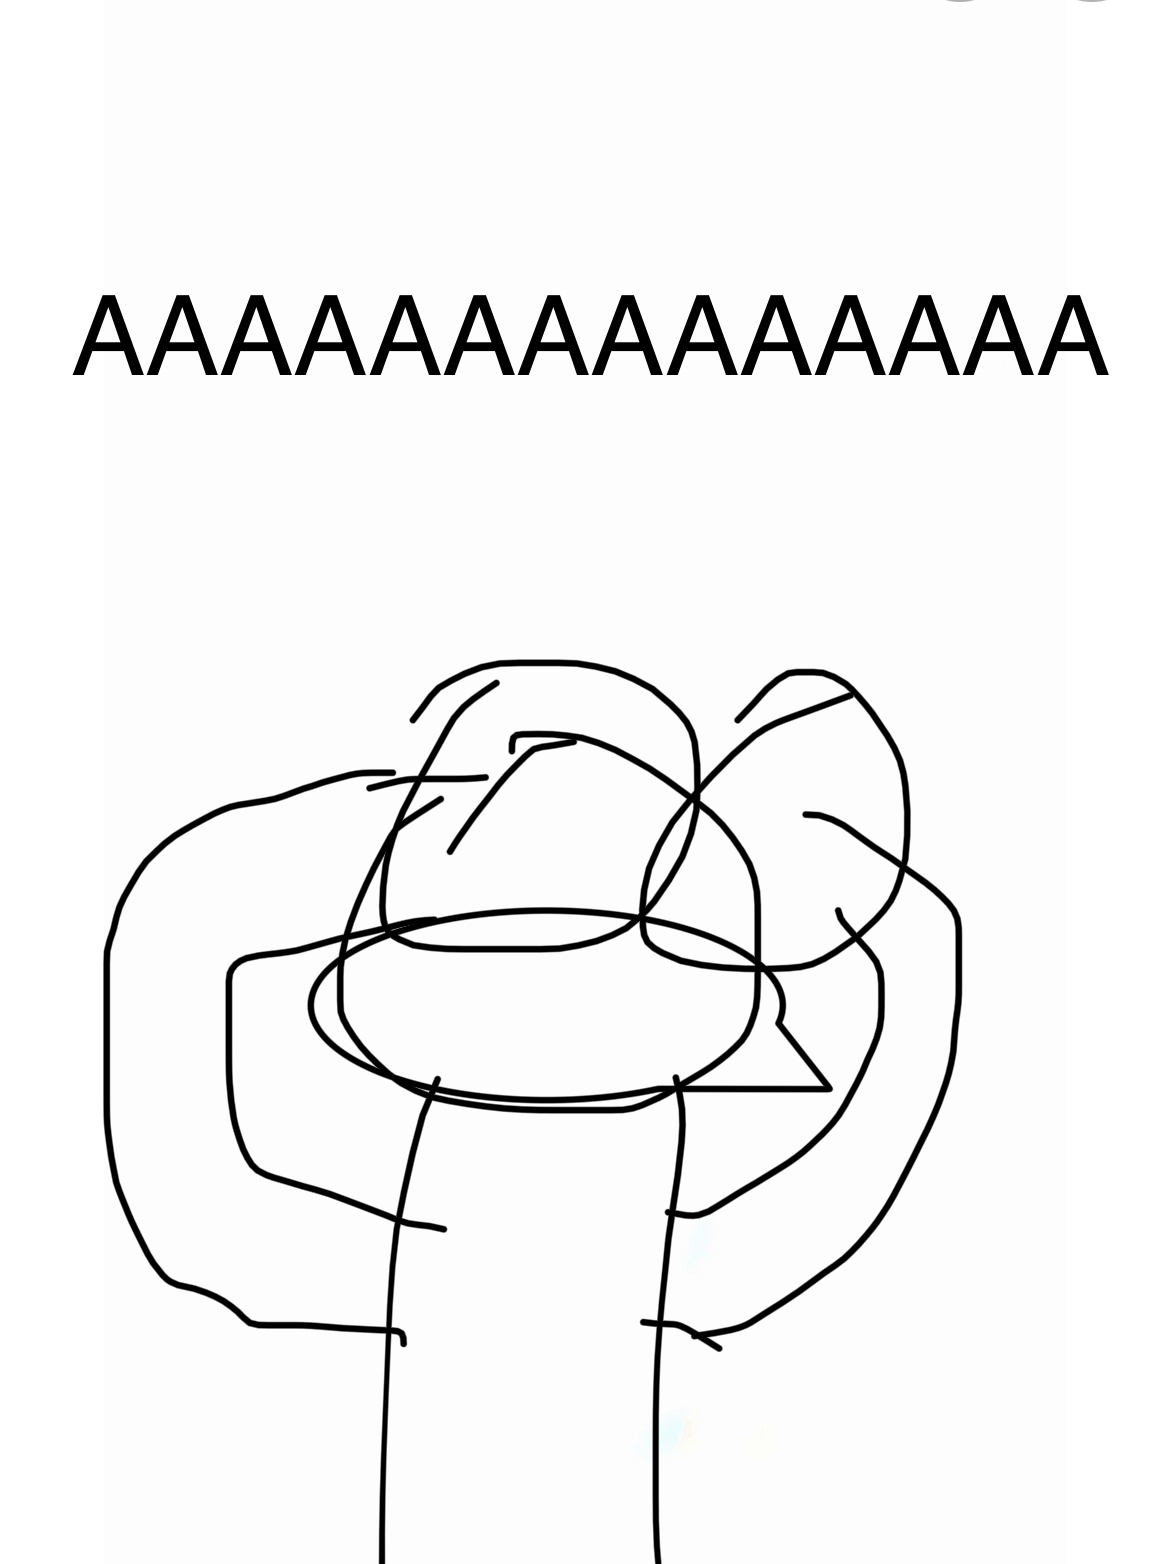 Everybody when Nintendo announced BOTW2